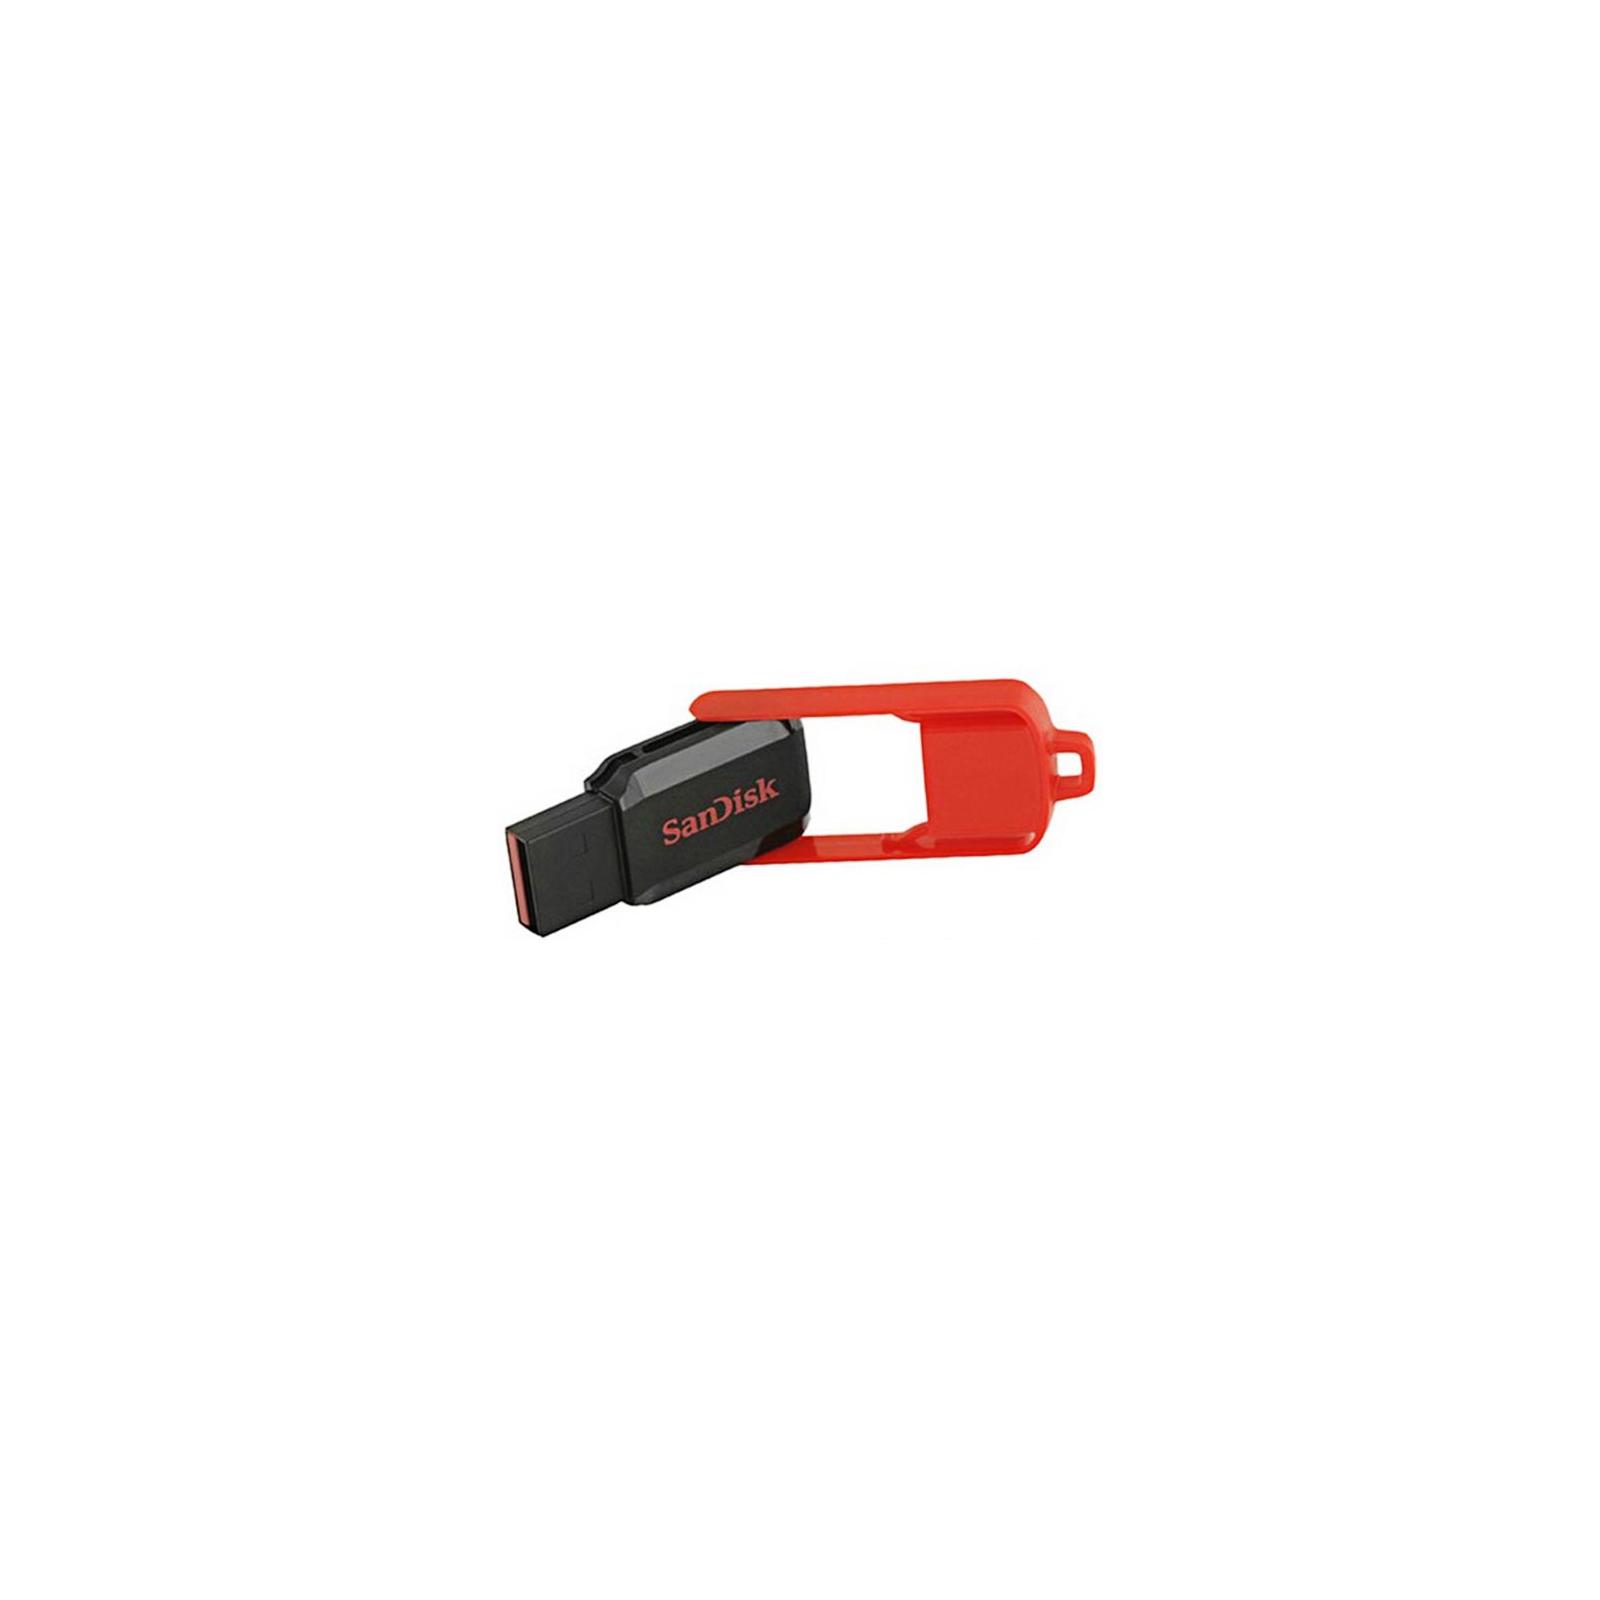 USB флеш накопитель SANDISK 32Gb Cruzer Switch (SDCZ52-032G-B35) изображение 3